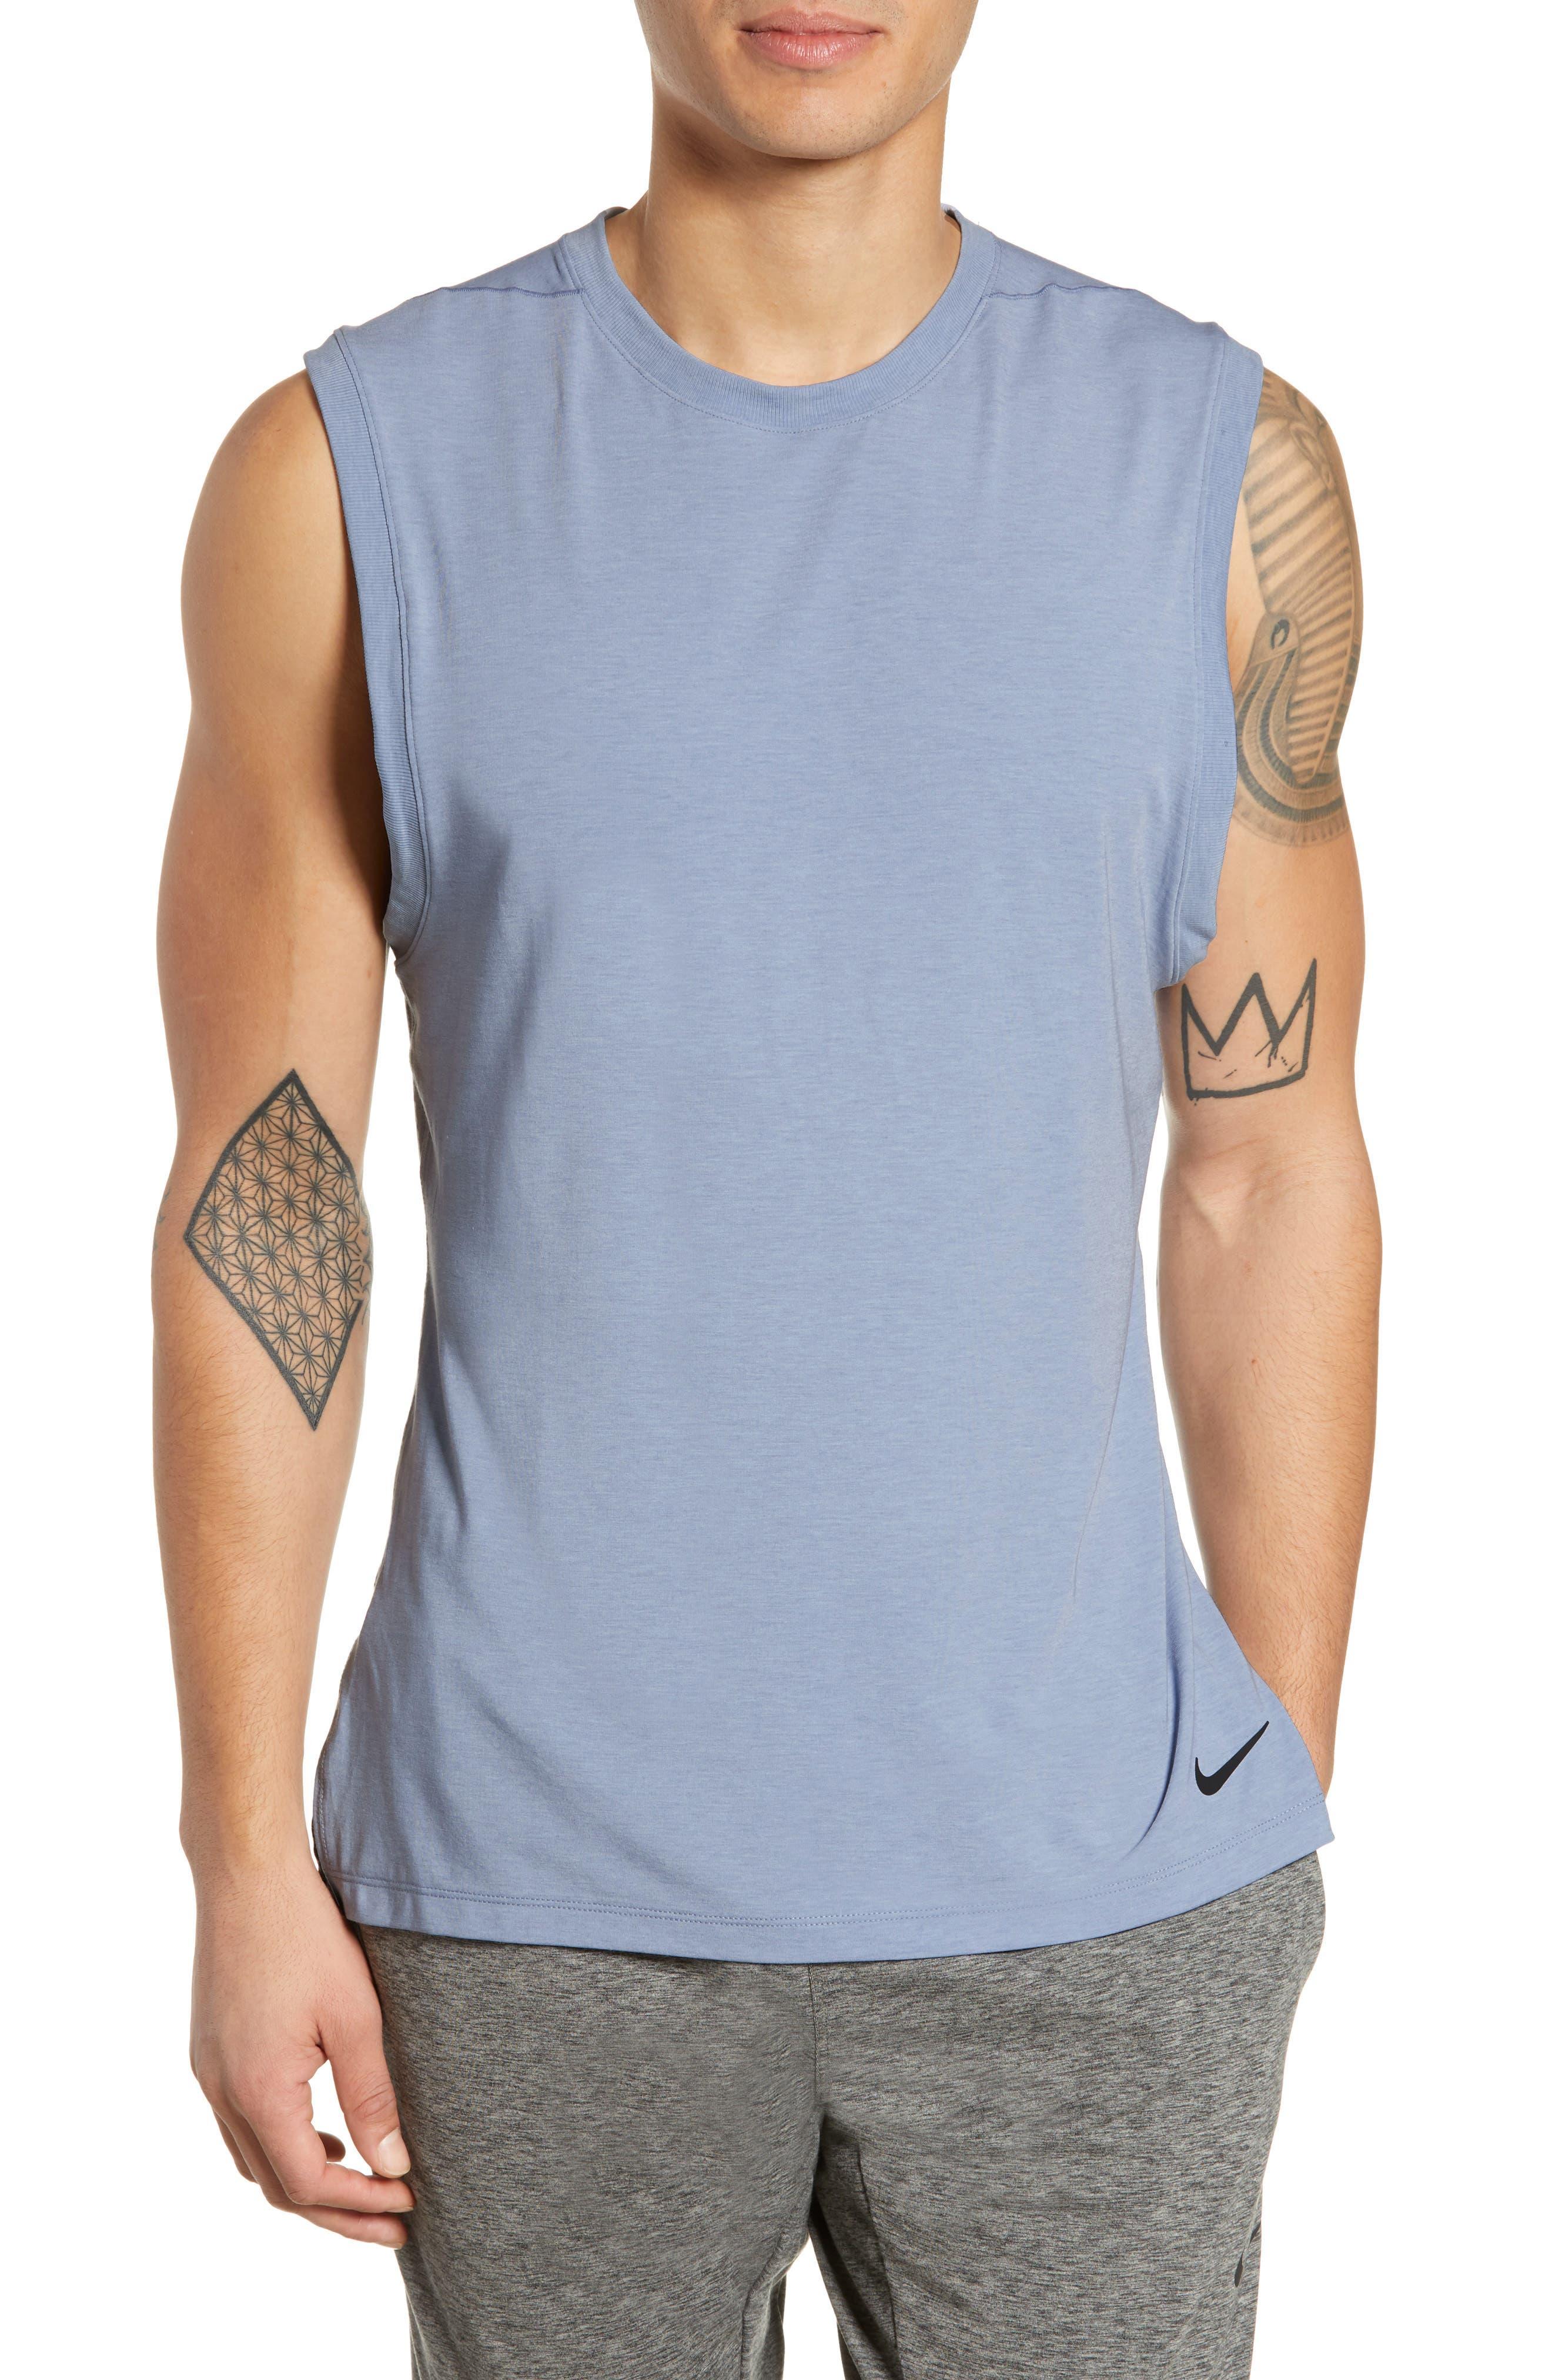 Nike Dry Transcent Sleeveless T-Shirt Blue